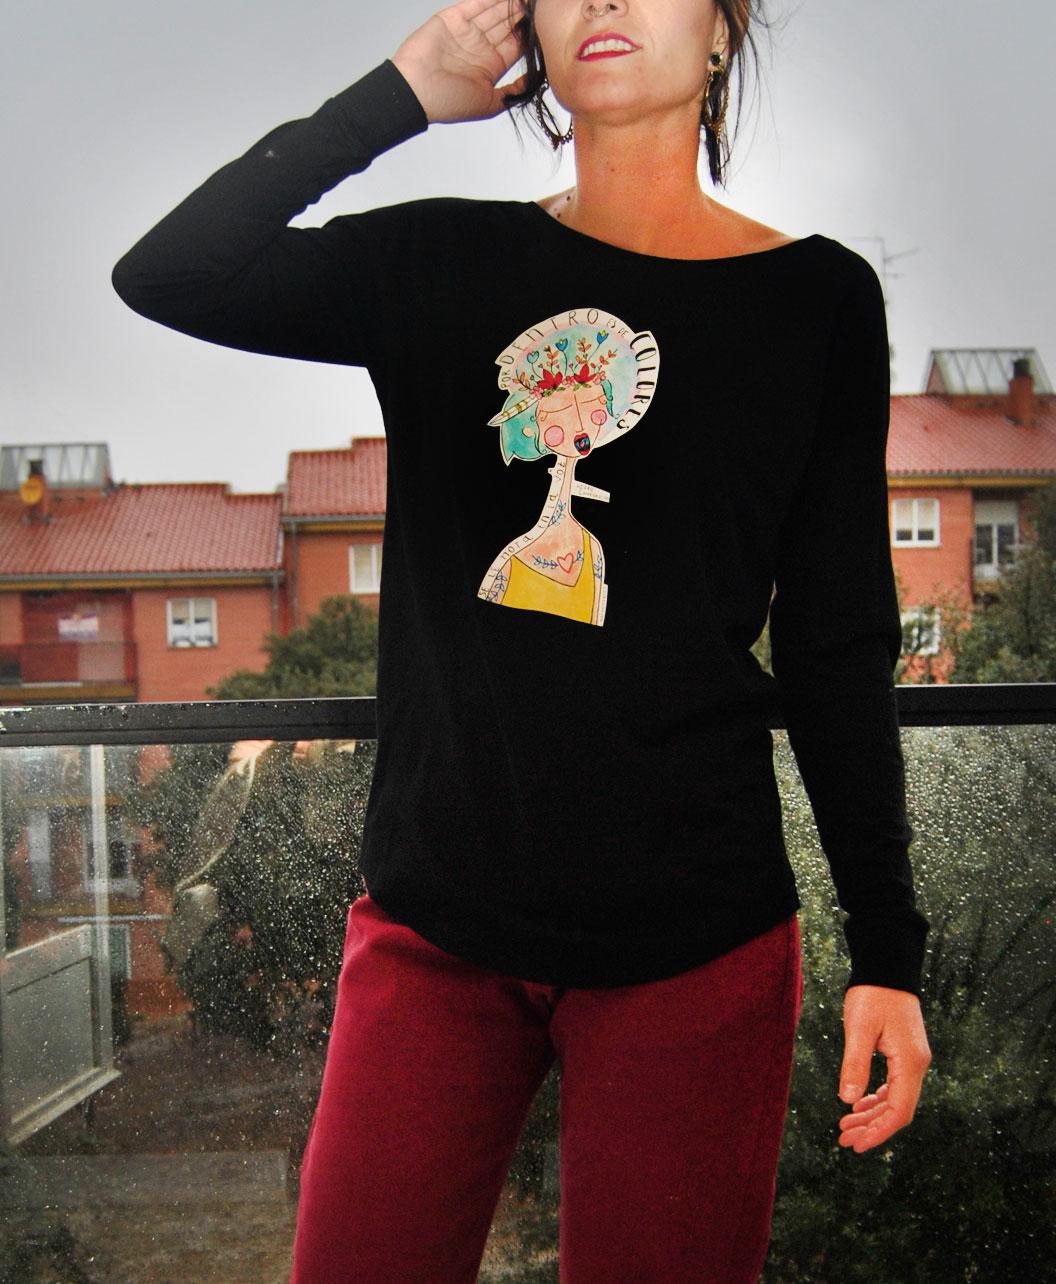 camiseta manga larga mujer algodon organico diferente original estilo alternativo voz color